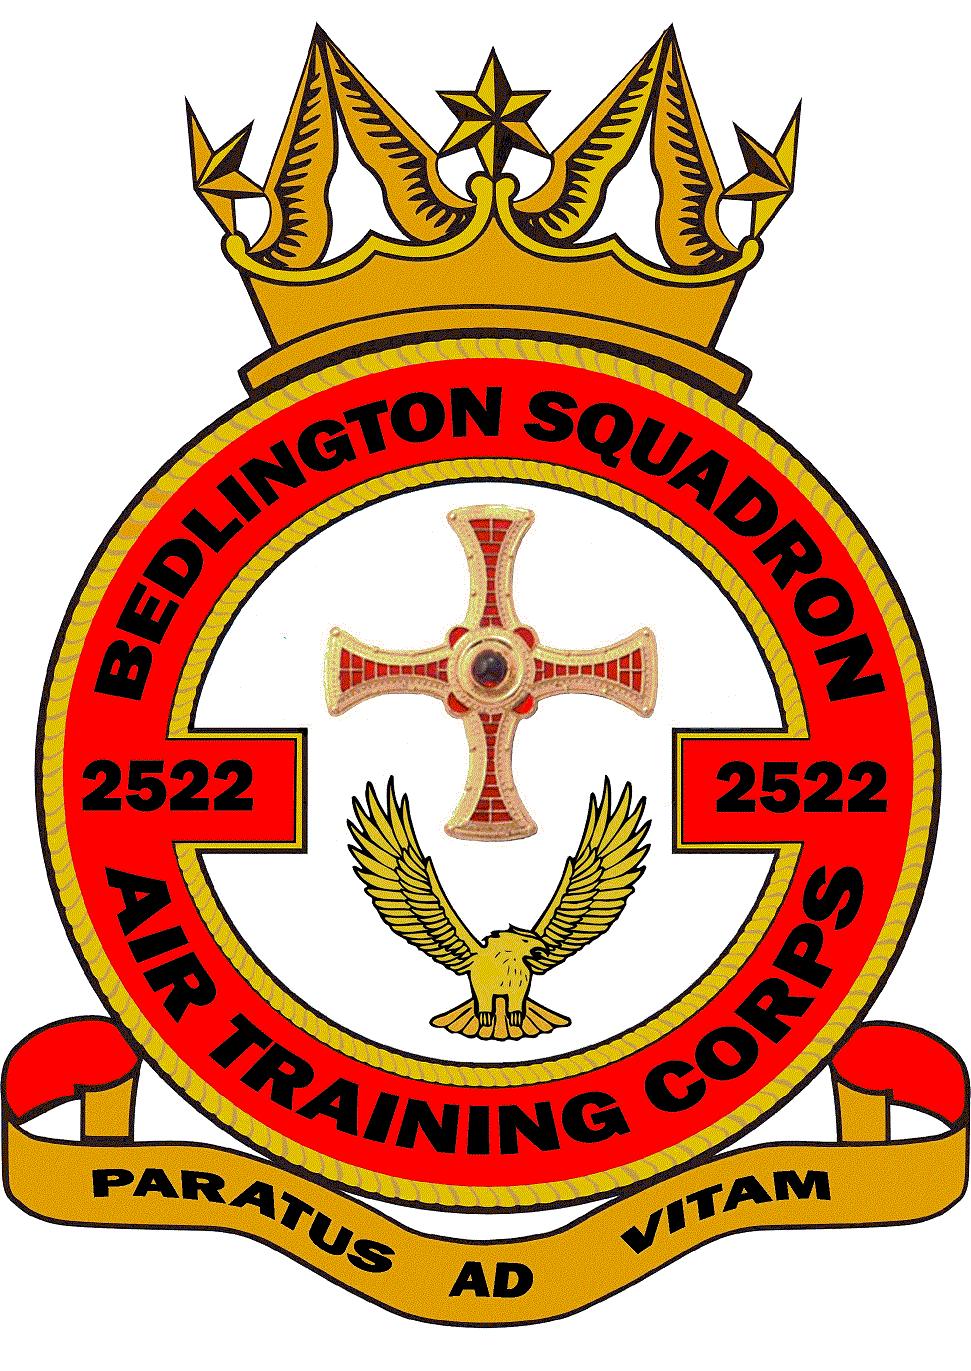 2522(Bedlington) Sqn